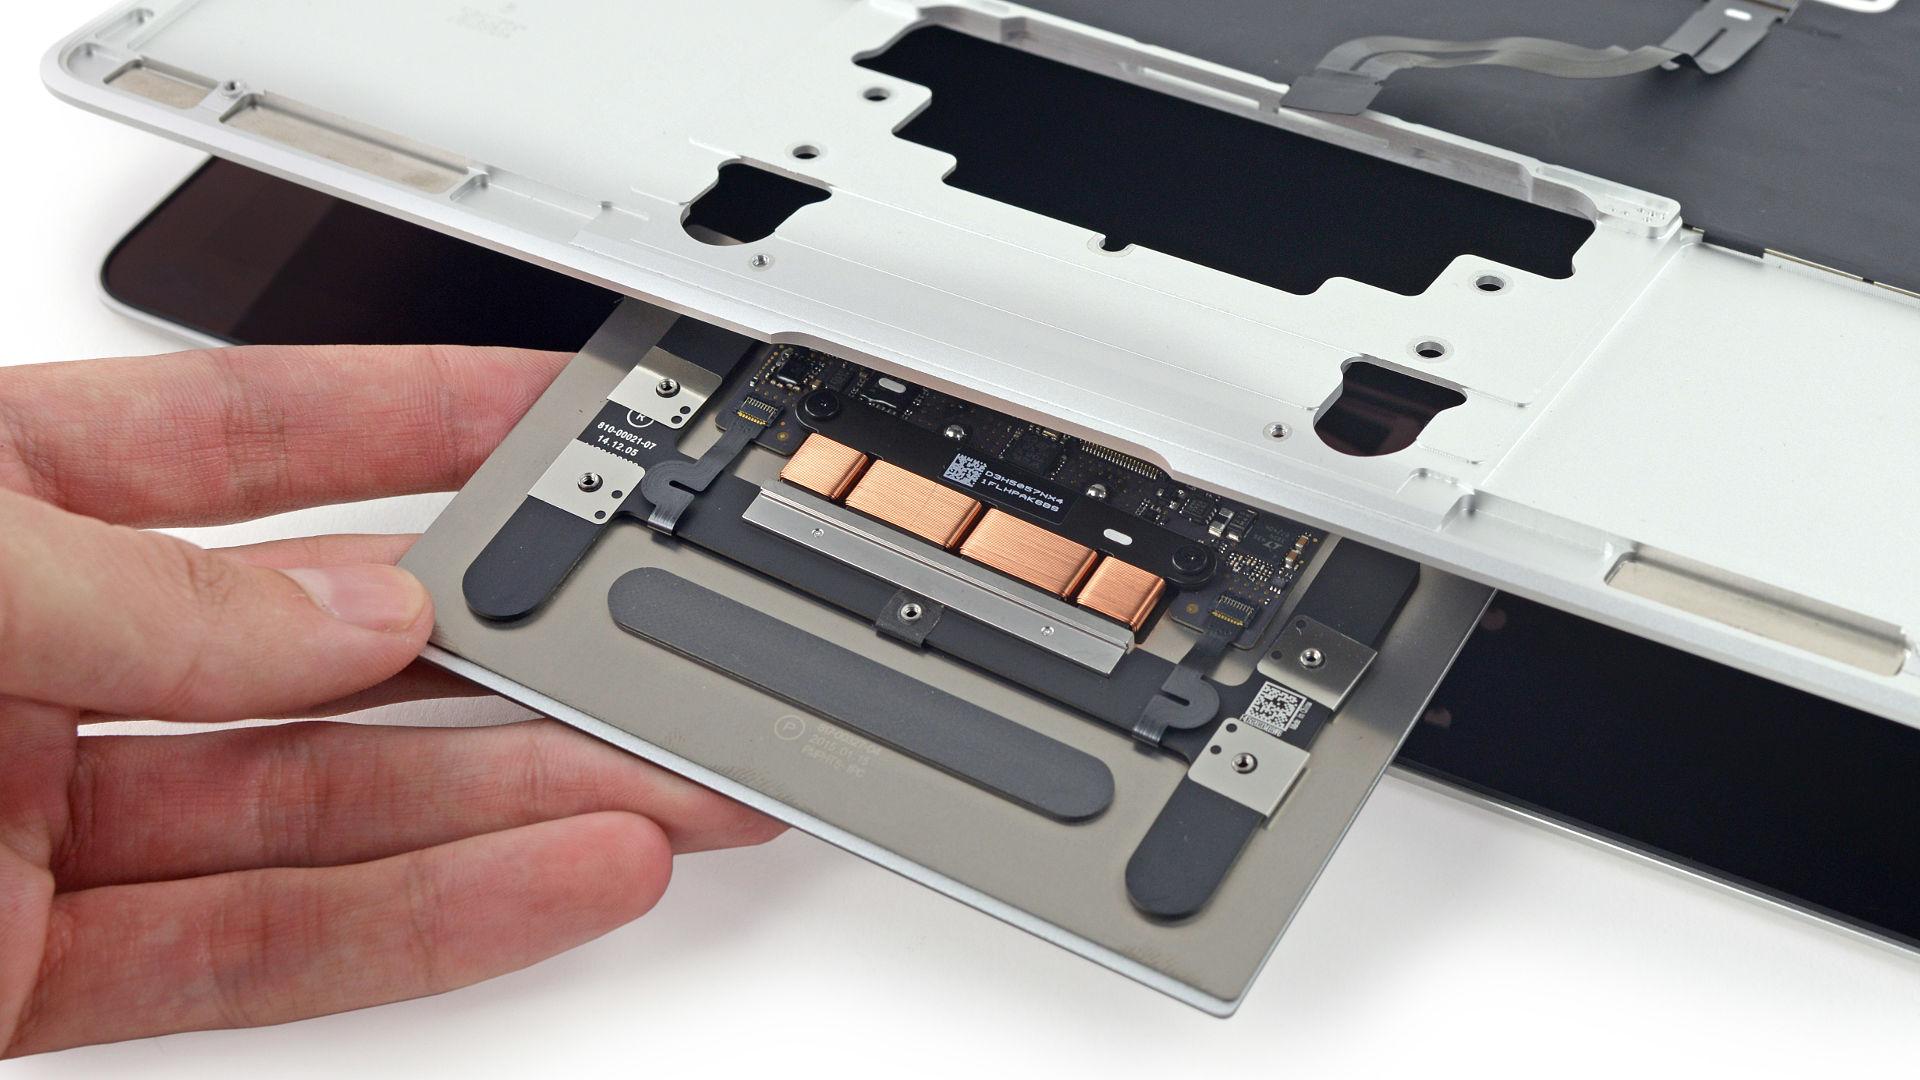 Замена трекпада MacBook в Харькове